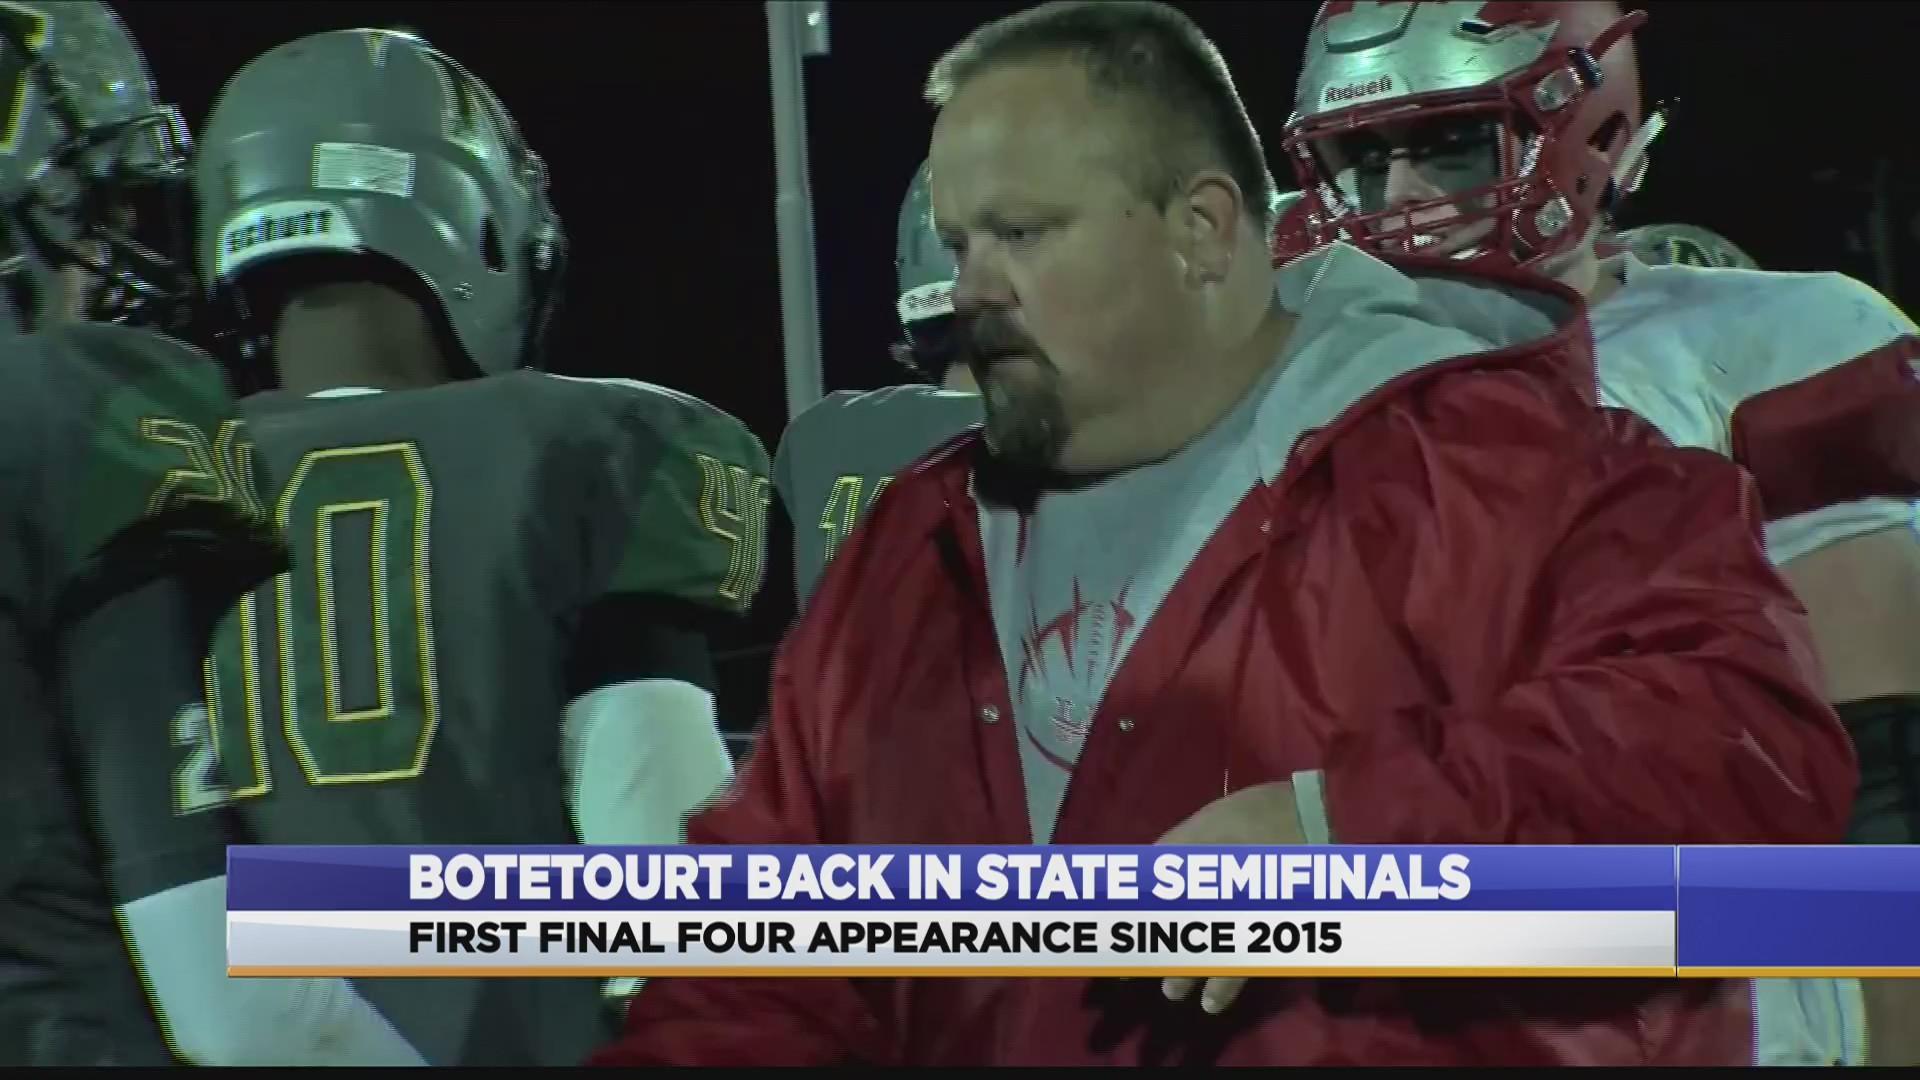 GOTW State Semifinals: Botetourt Back In State Semifinals